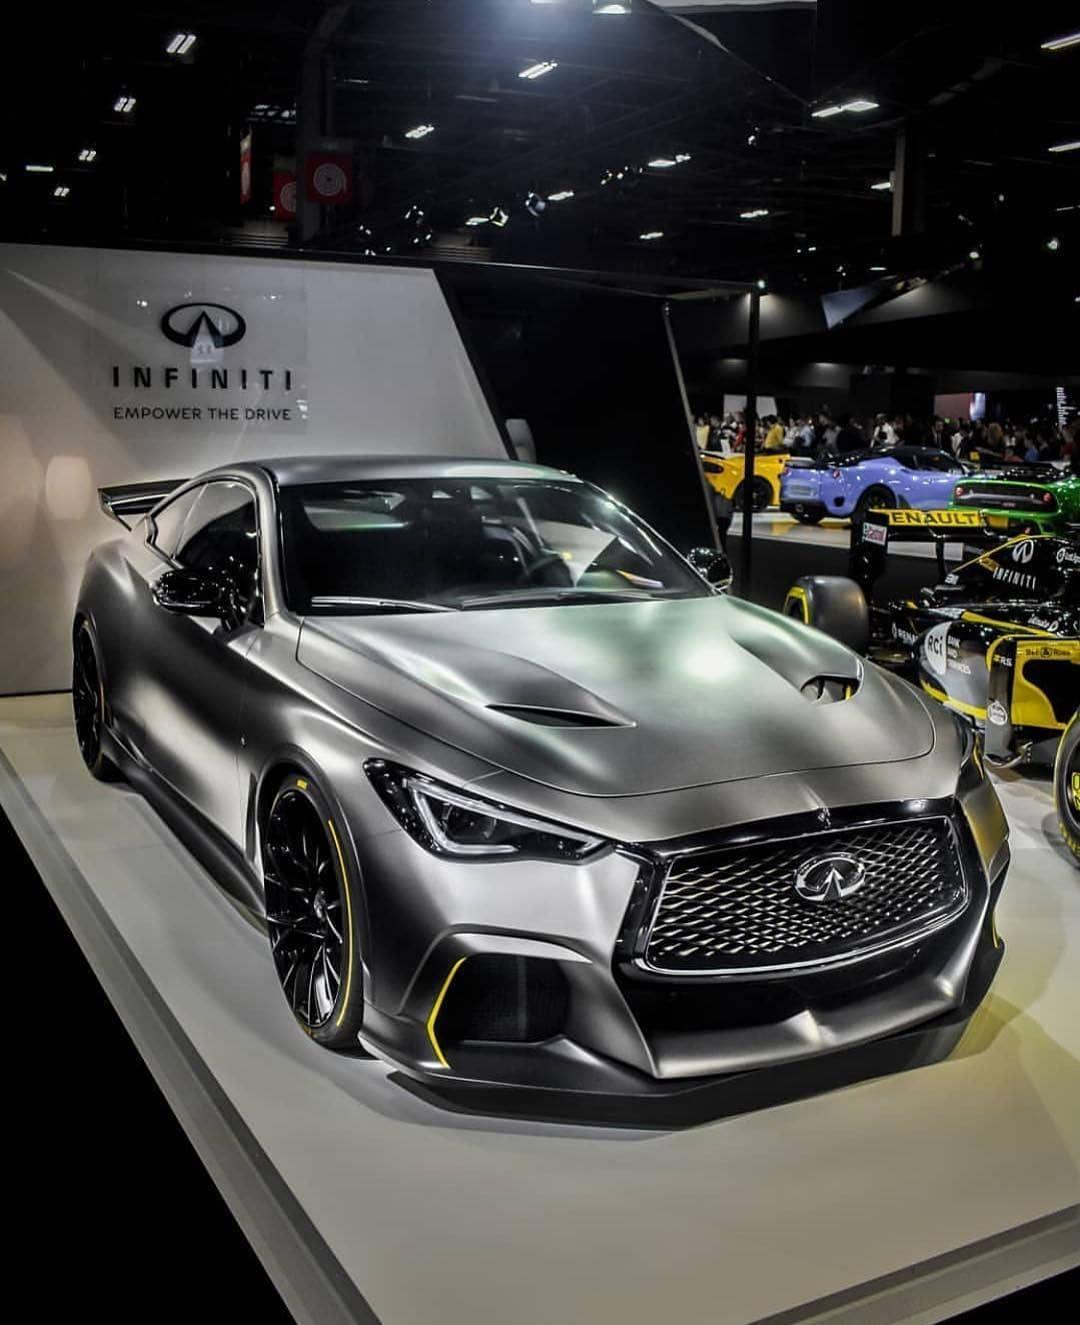 Infinity Q60 Black S Follow Carmantic For More Latest Cars Cars Super Cars